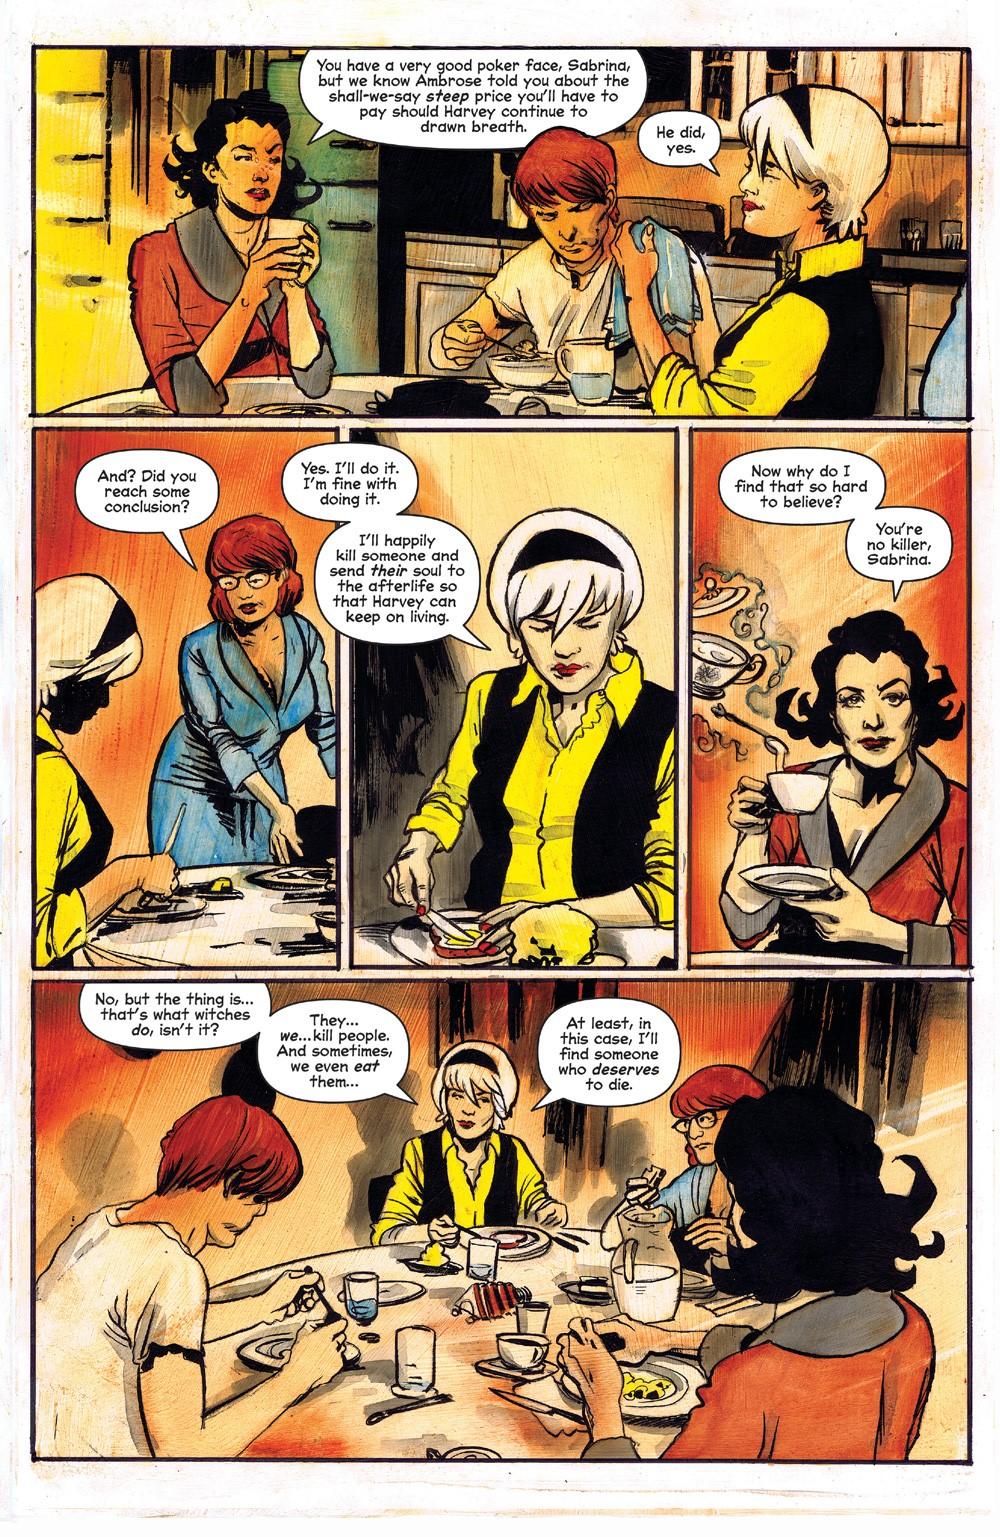 ChillingAdventuresOfSabrina_09-03 ComicList Previews: CHILLING ADVENTURES OF SABRINA #9